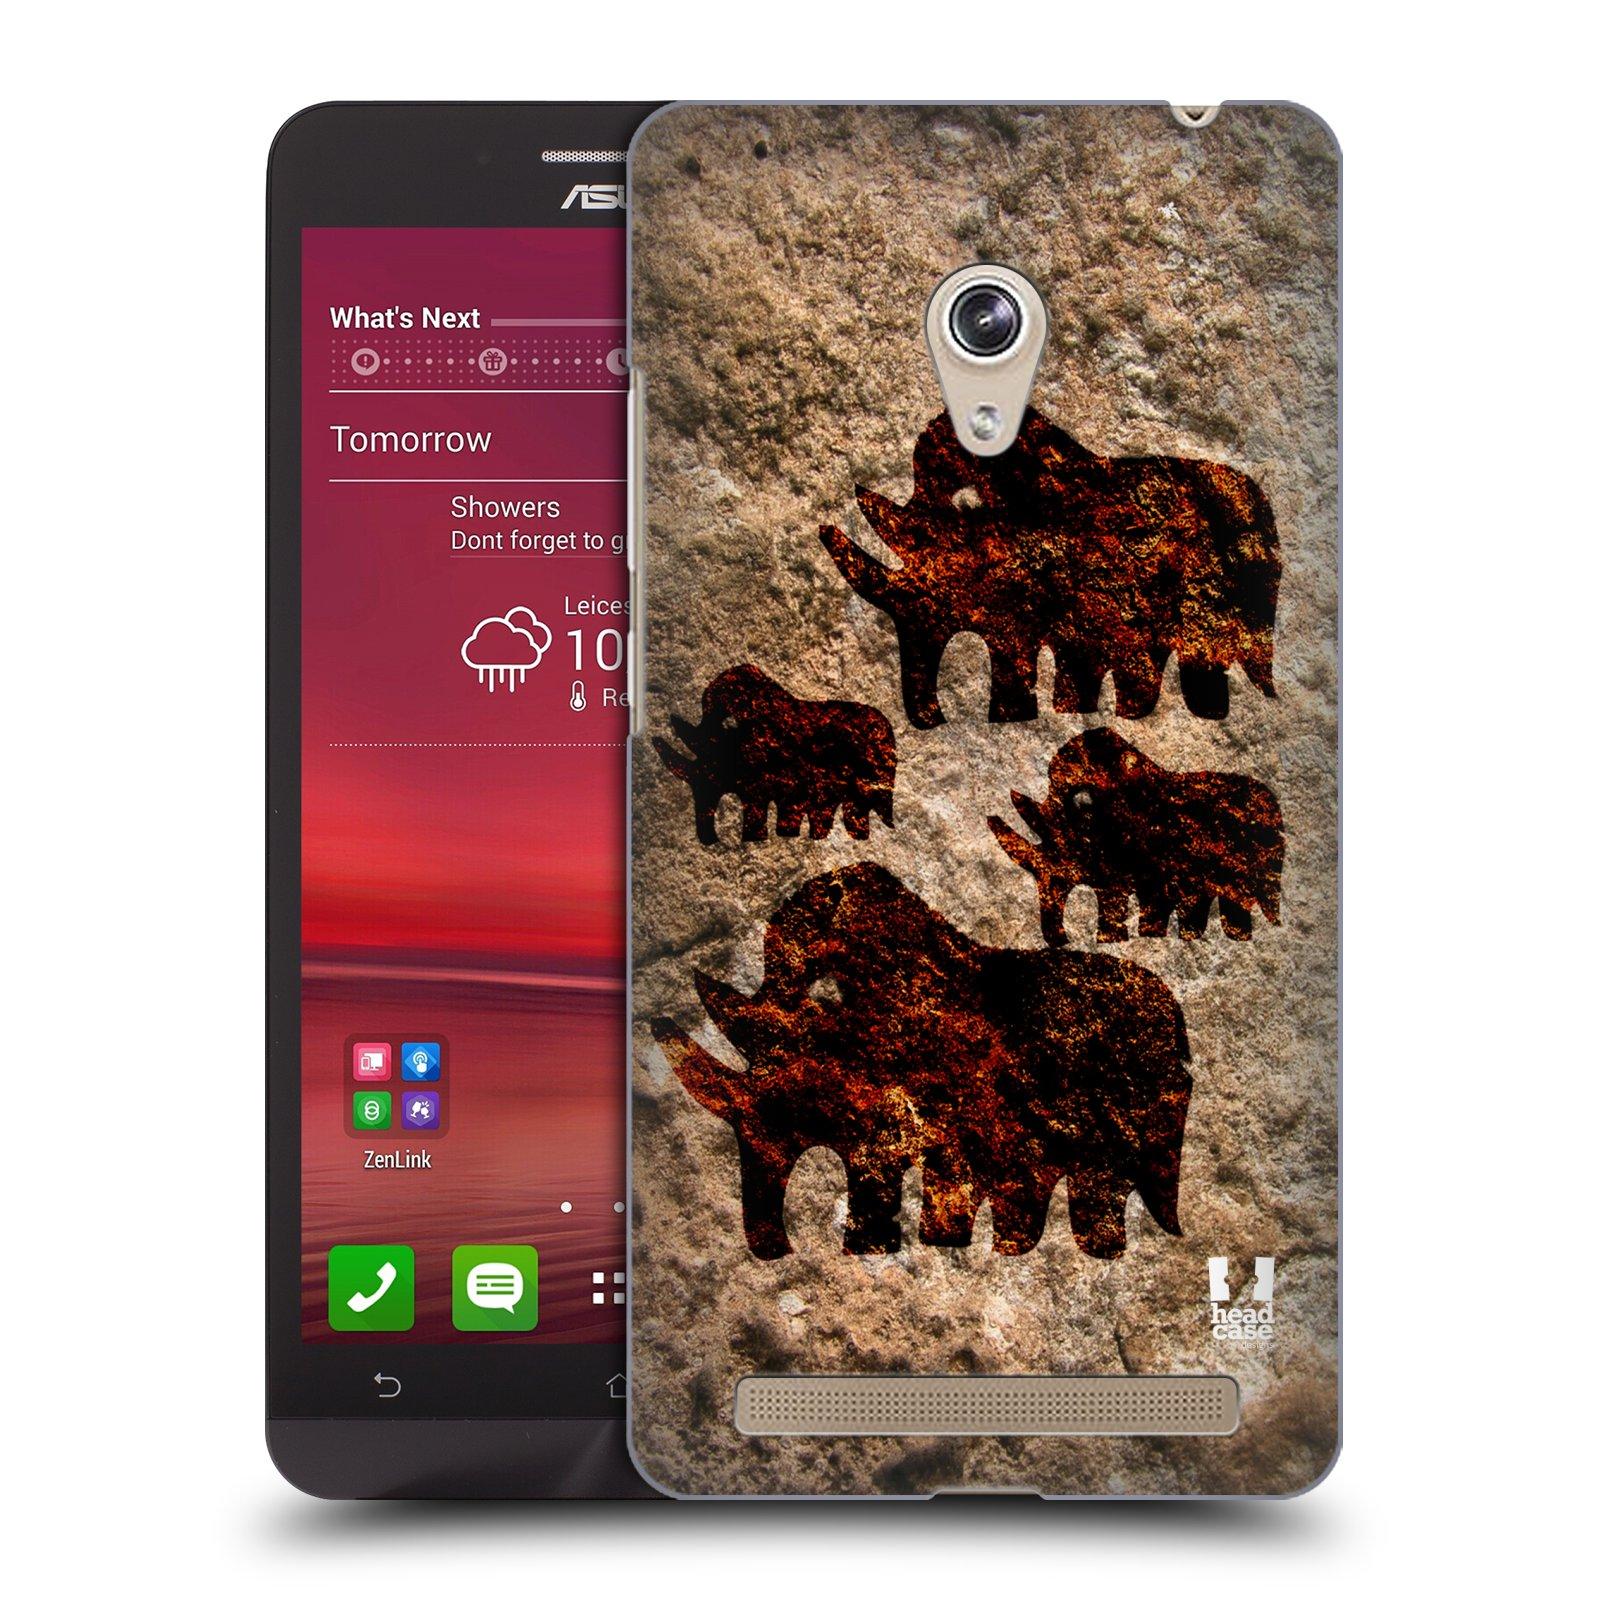 HEAD CASE plastový obal na mobil Asus Zenfone 6 vzor Pravěké malby MAMUT